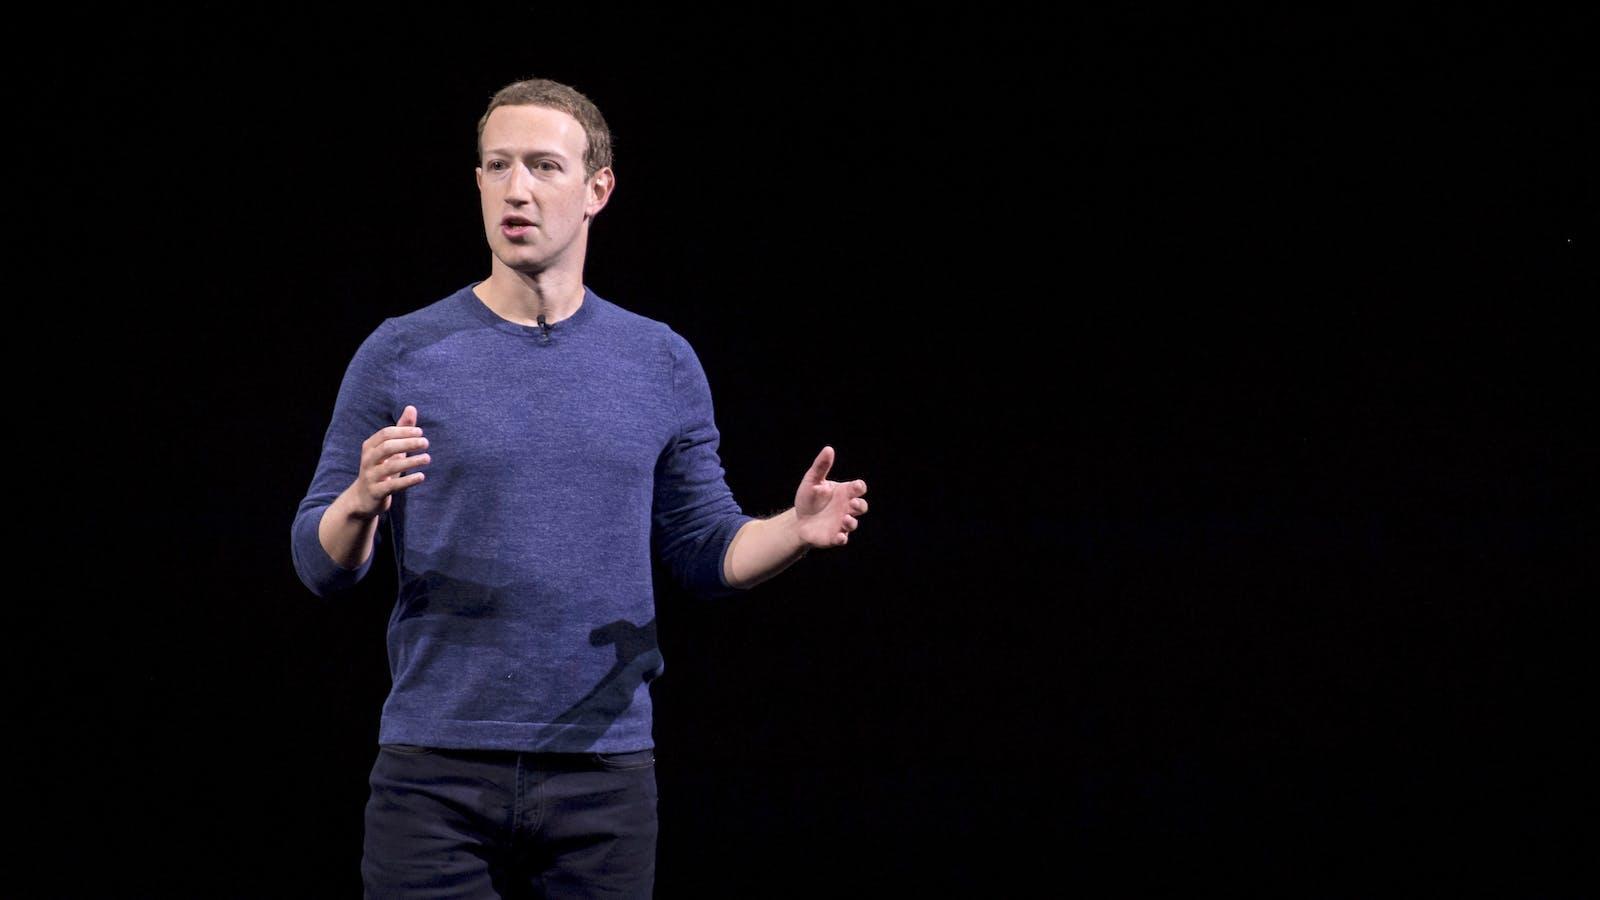 Facebook CEO Mark Zuckerberg. Photo by Bloomberg